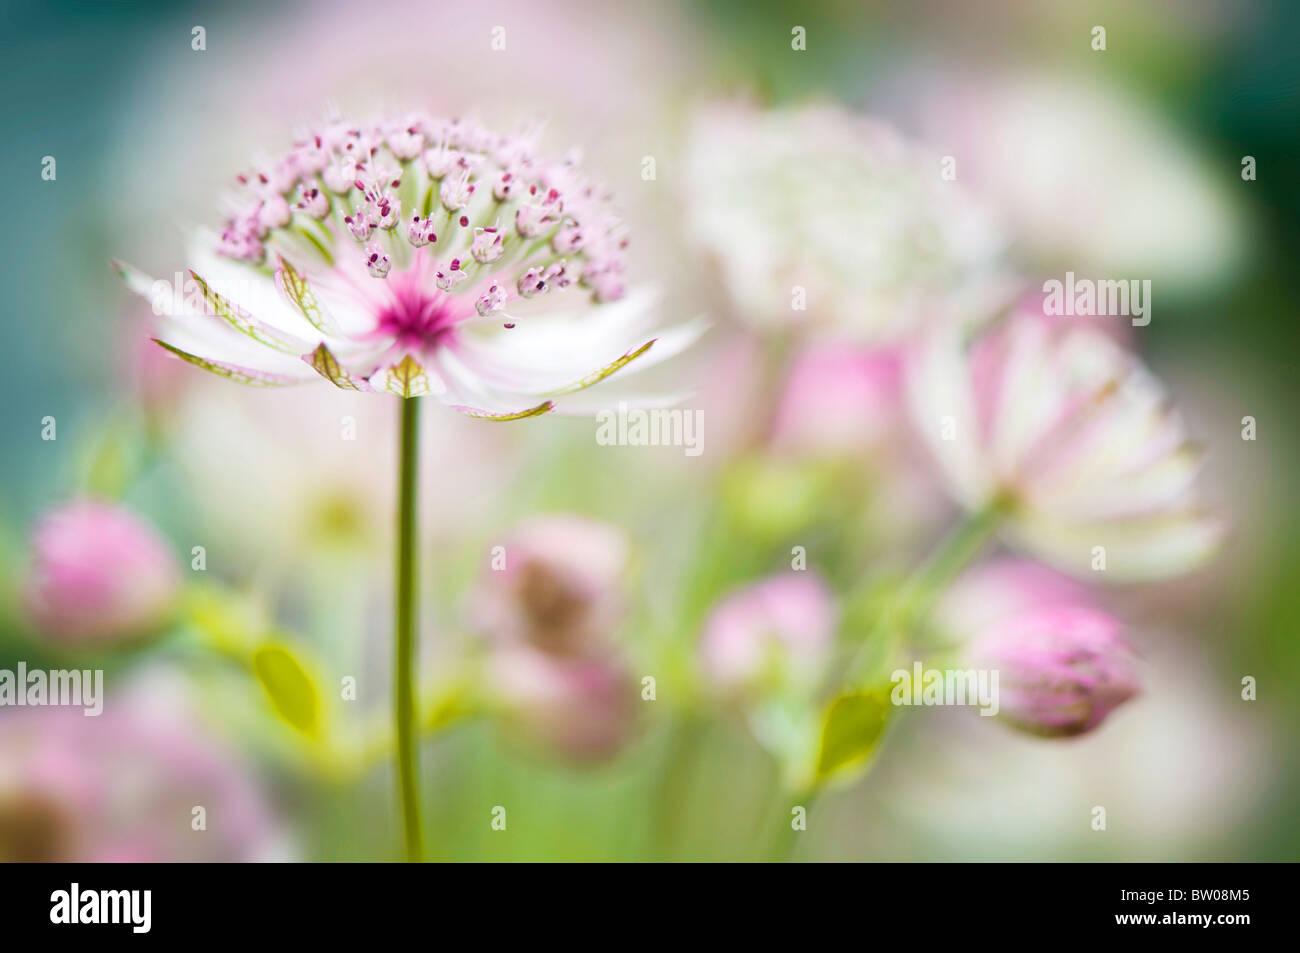 Astrantia major 'Bo Anne' pink flowers - Stock Image